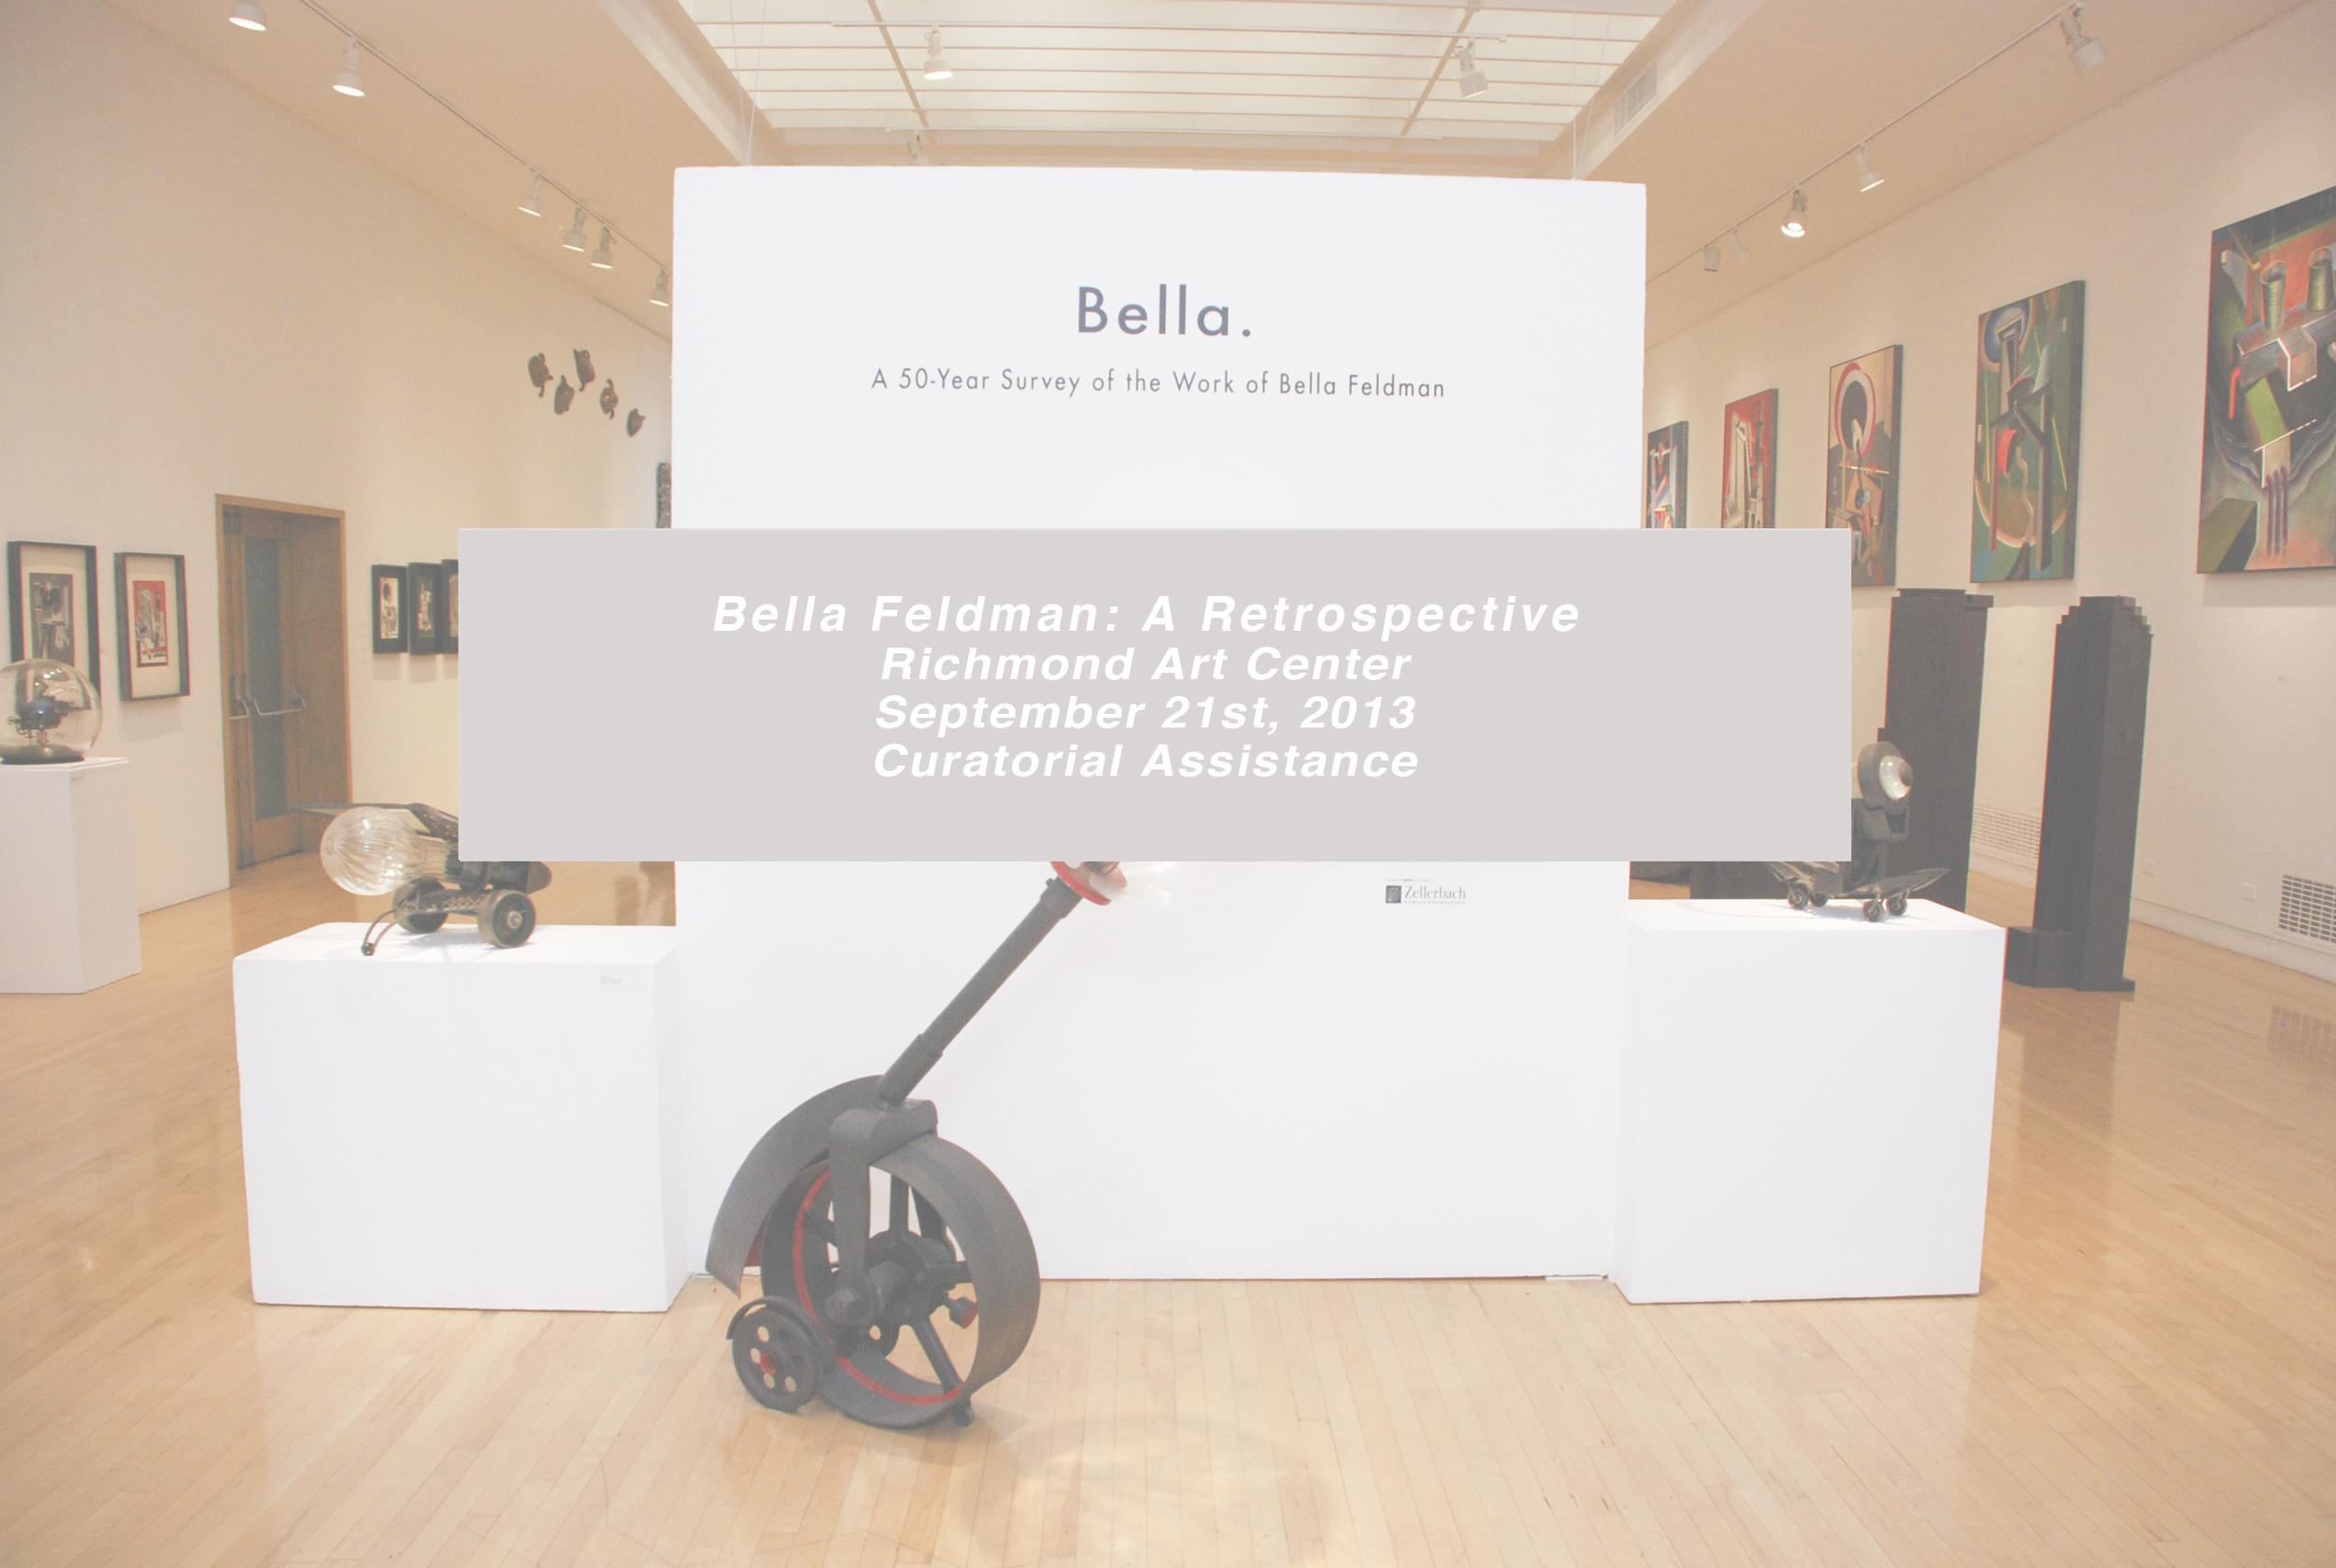 Bella RAC 02 cover photo.jpg